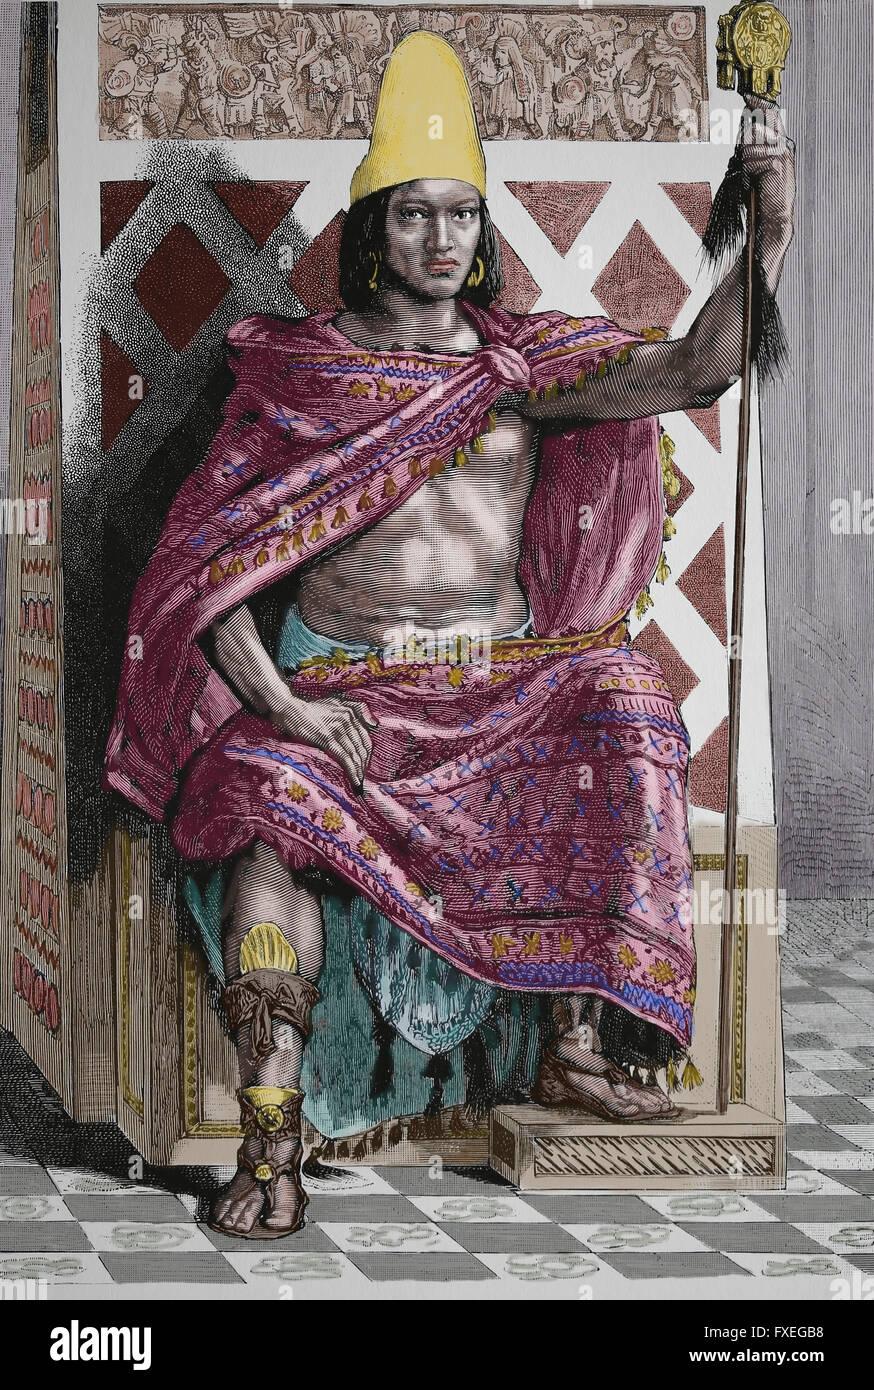 Maya king. Engraving, 19th century. America. Mexico. Color. - Stock Image